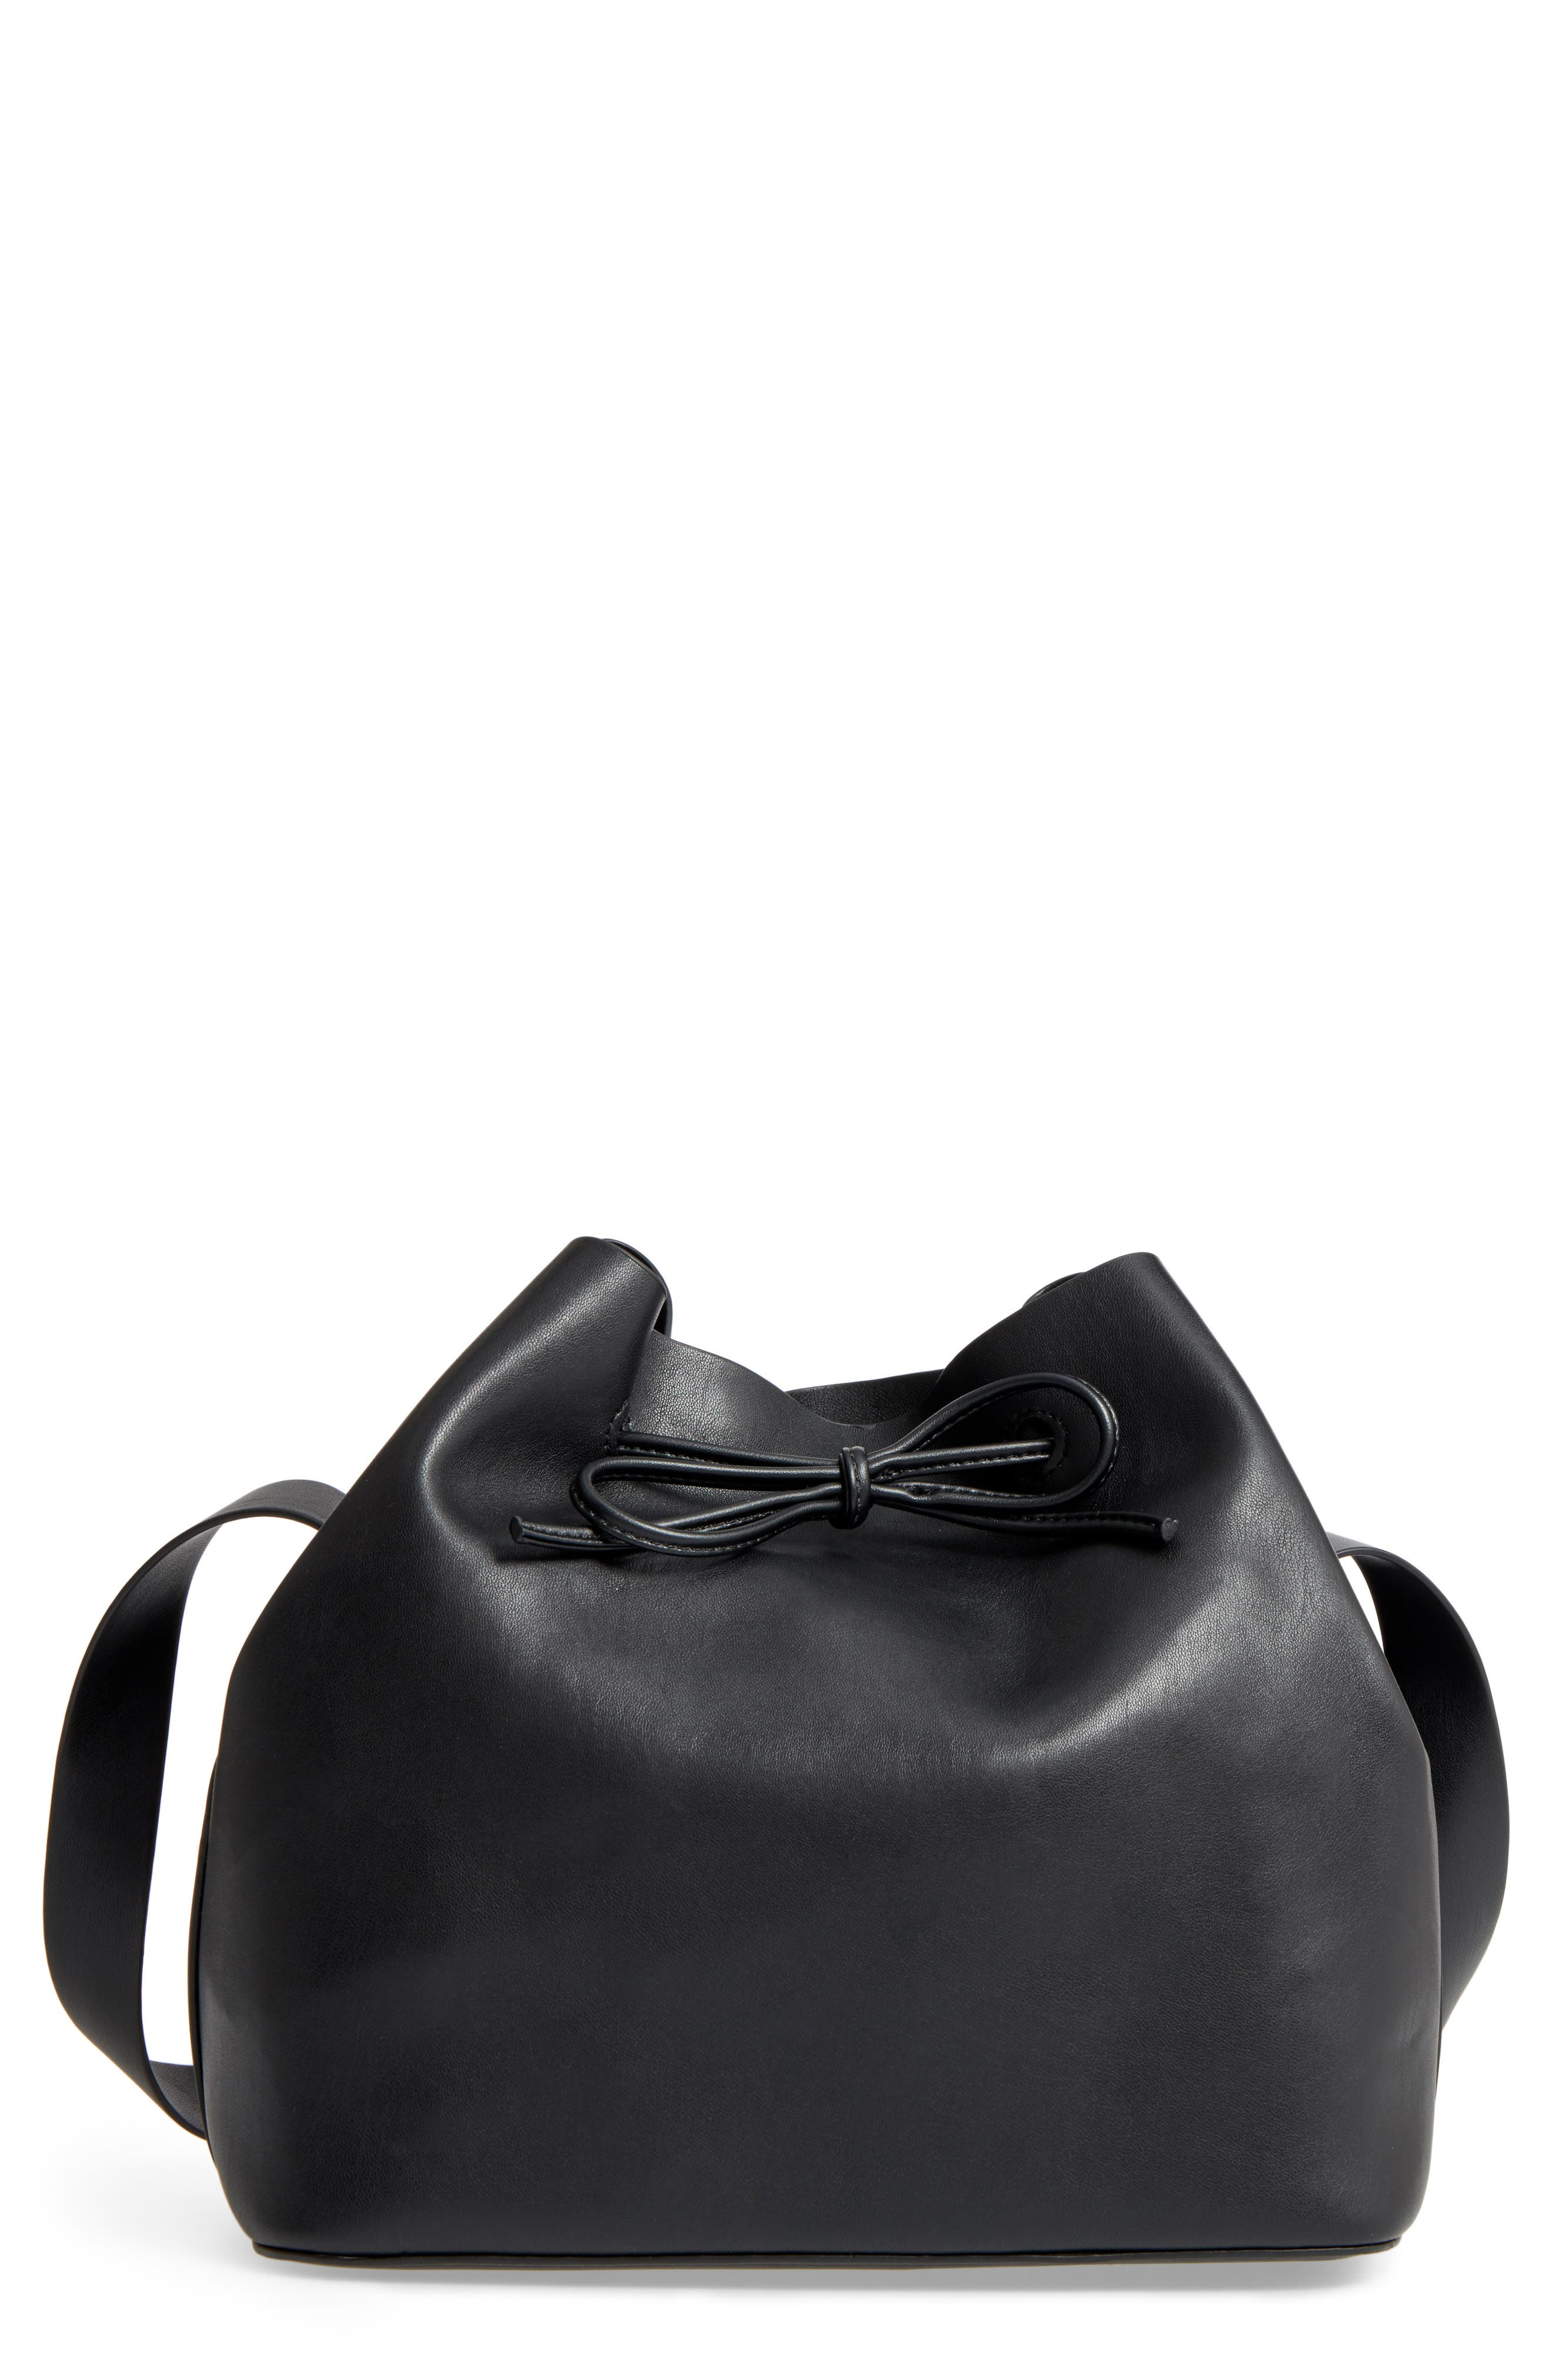 Stella Faux Leather Bucket Bag,                             Main thumbnail 1, color,                             001